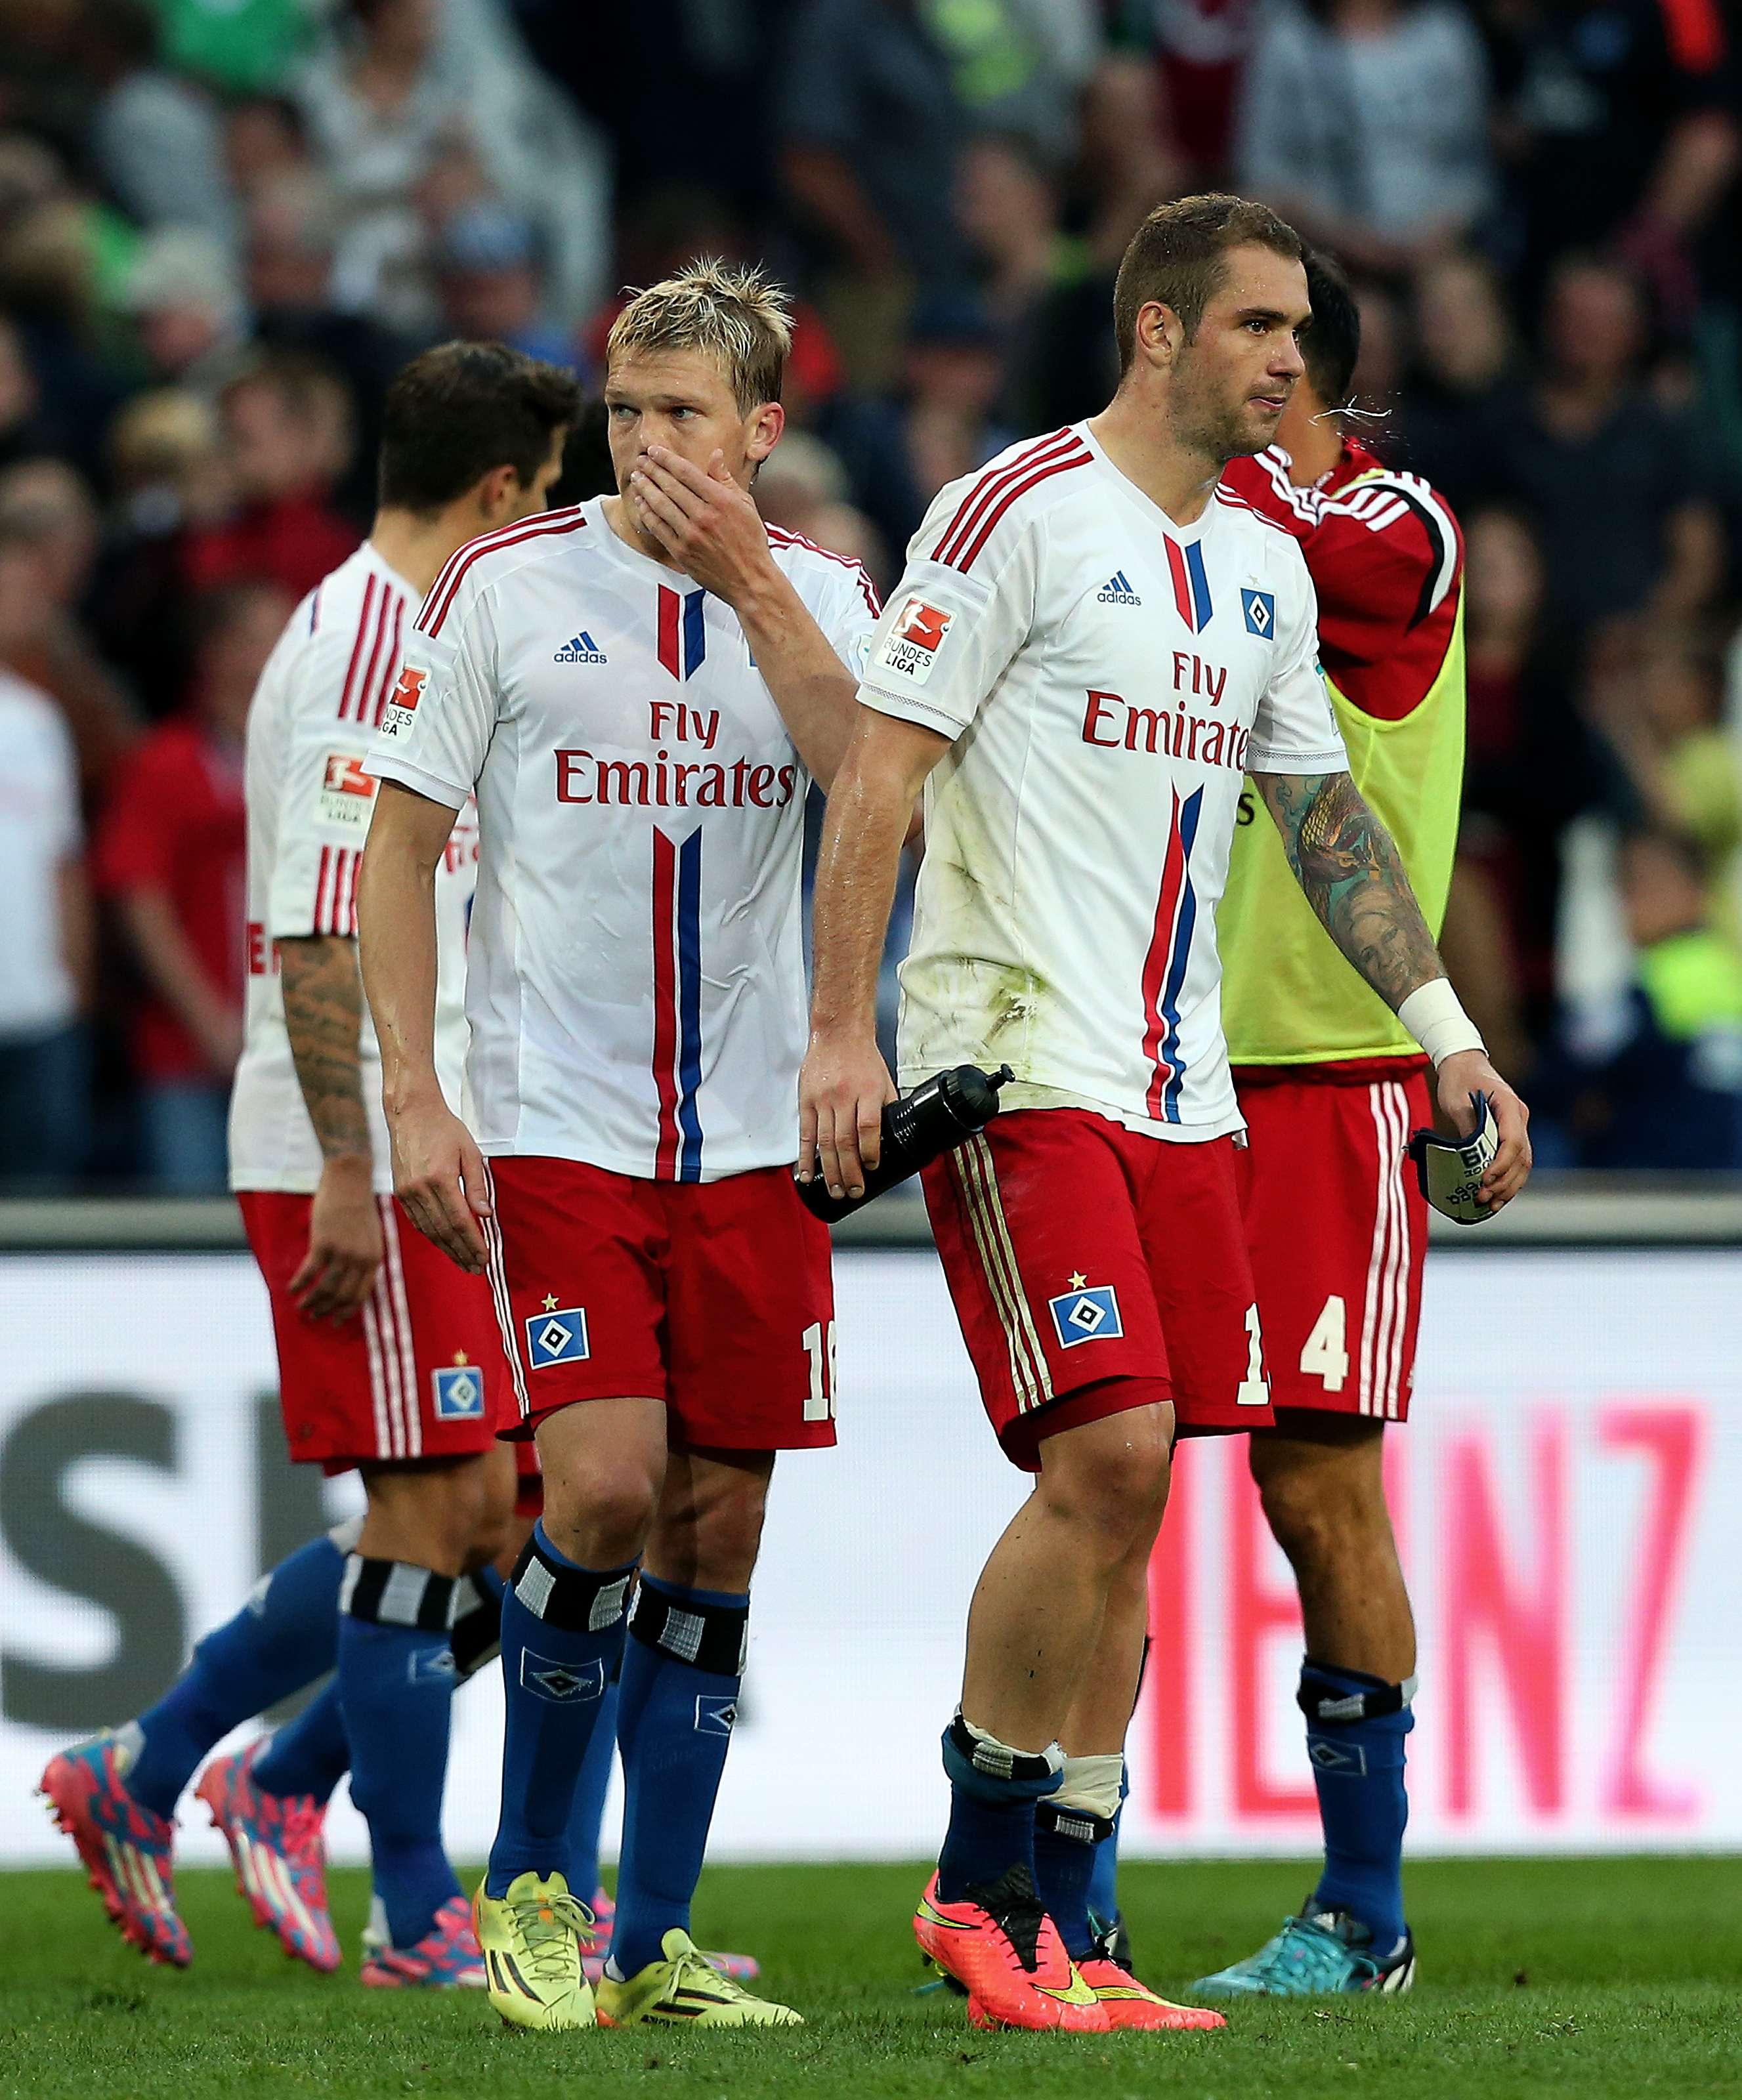 Jogadores do Hamburgo lamentam derrota Foto: RONNY HARTMANN/AFP